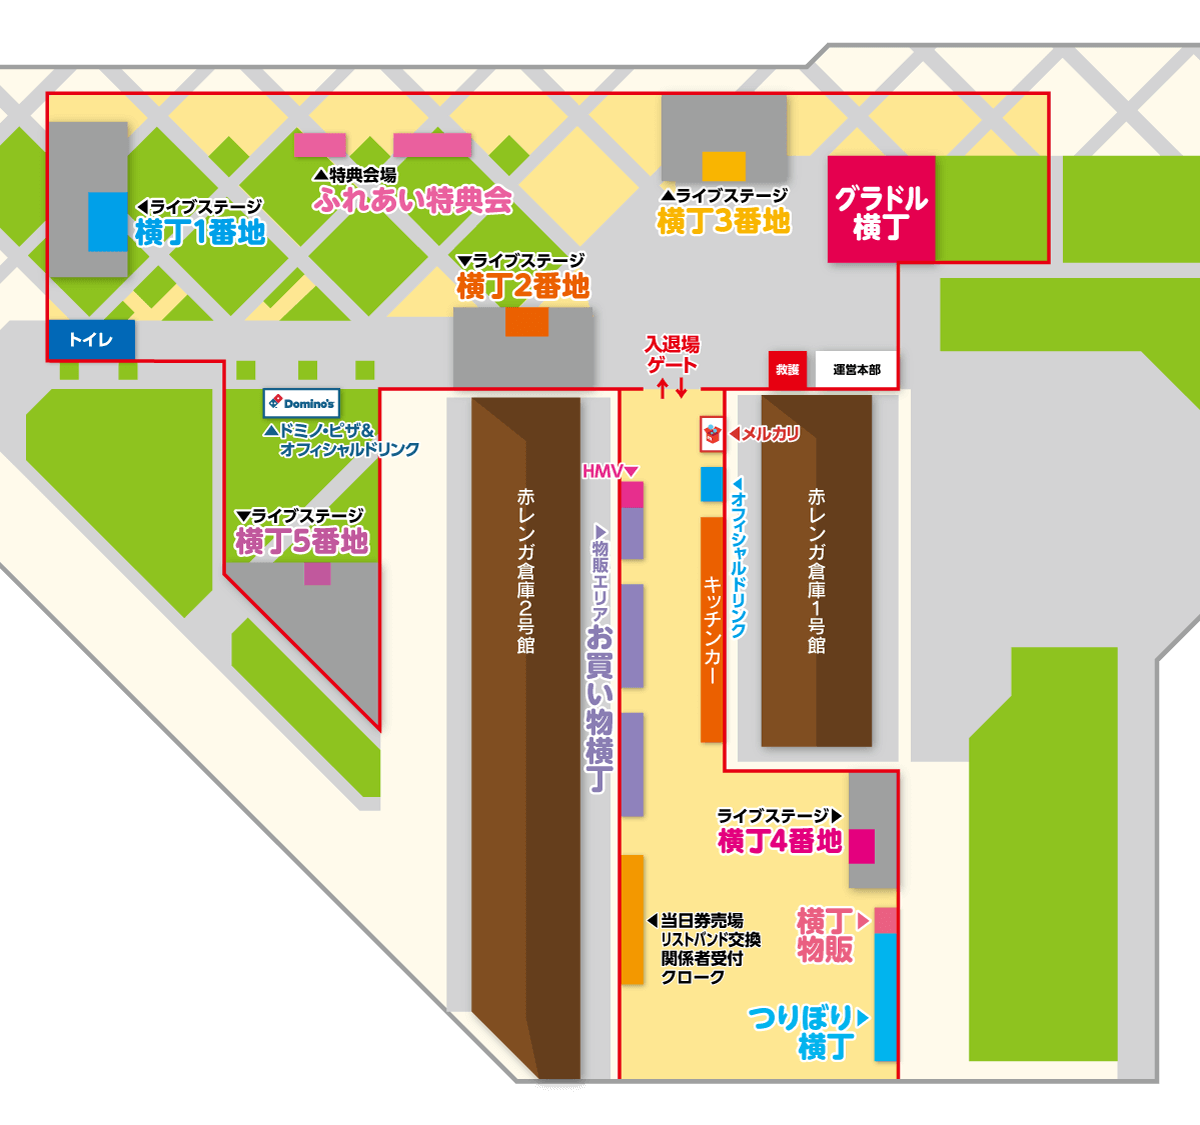 http://idolyokocho.com/summerfes2017/img/map.png